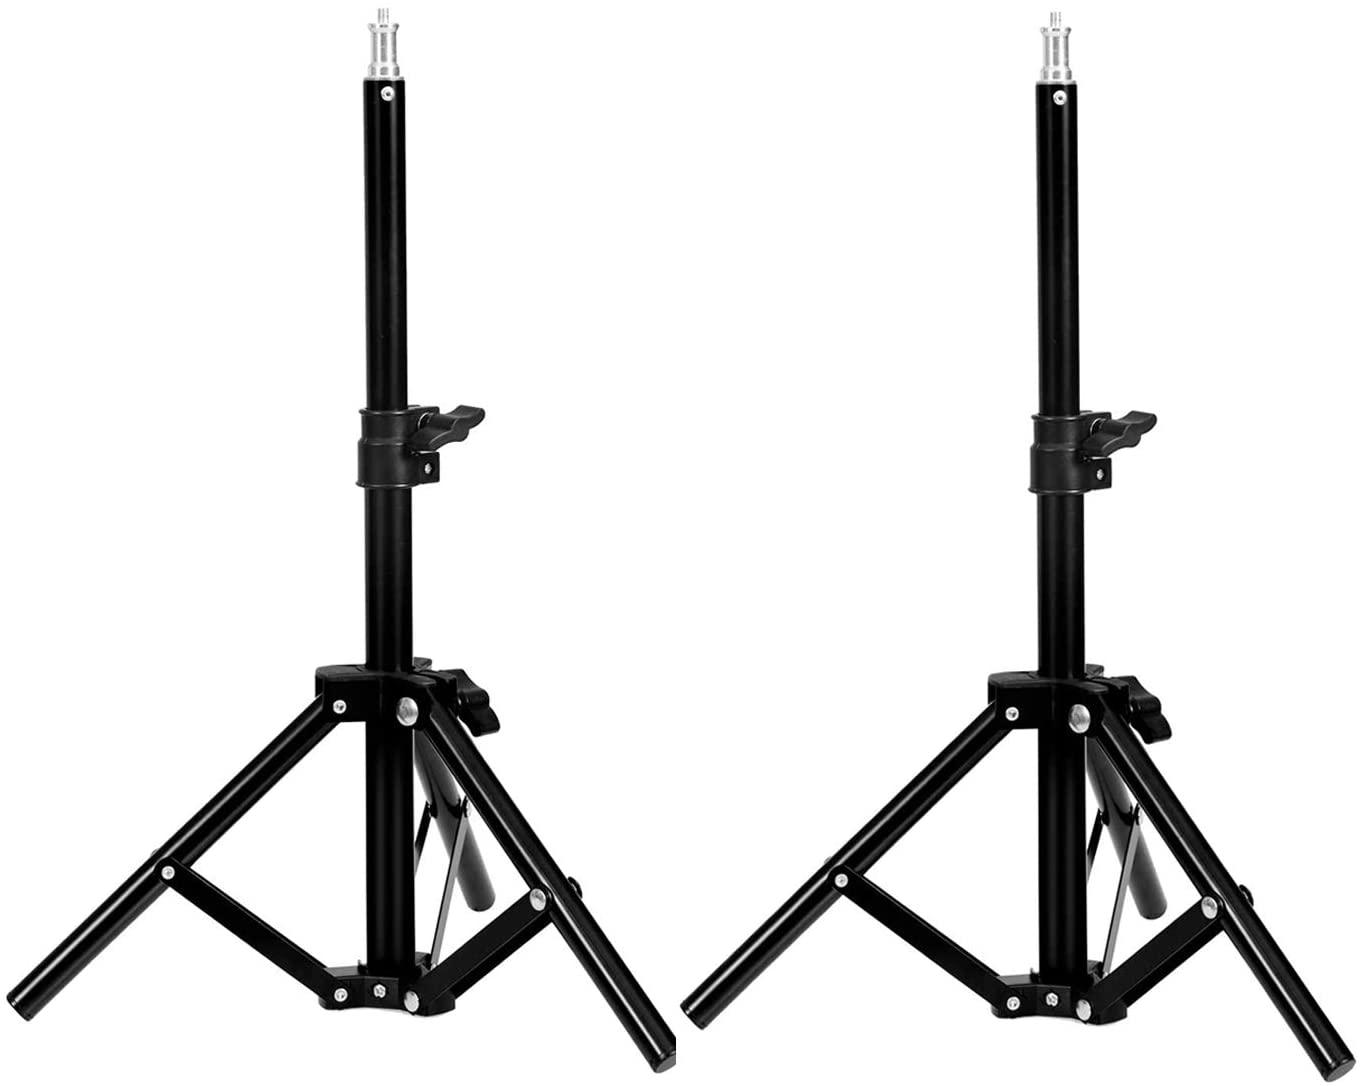 Selens Tabletop Light Stand Photography 19.6Inch/50 cm Mini Tripod for Ring Light Video Recording Photo Studio Lighting, 2 Pack